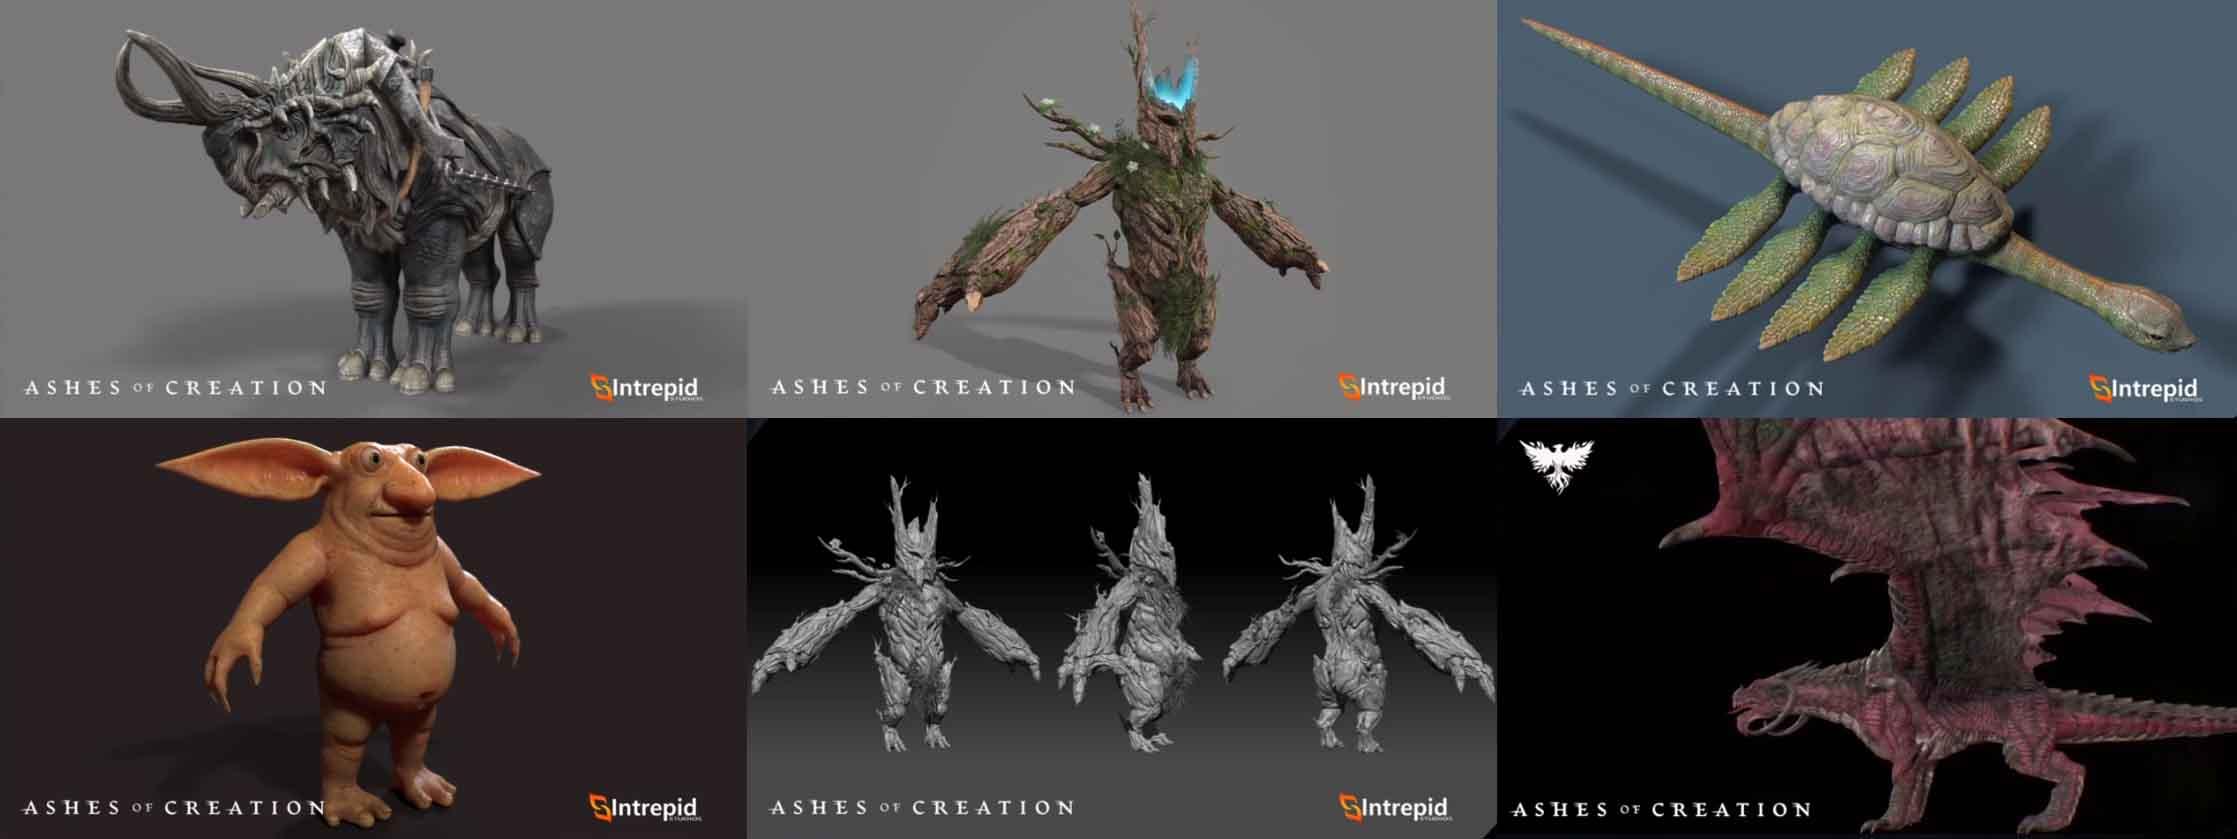 Ashes of Creation, Intrepid Studios